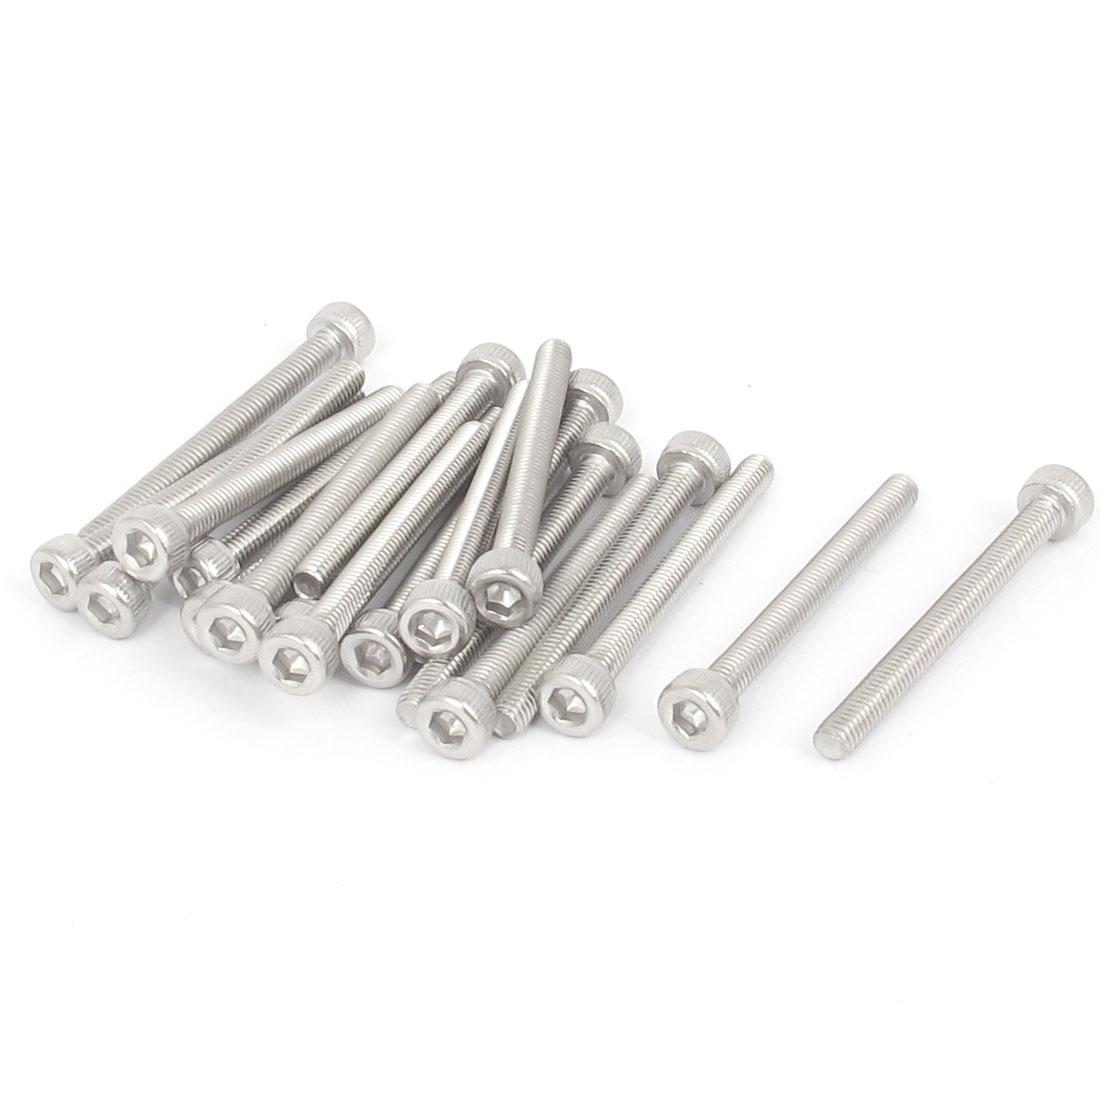 M3x30mm Thread 304 Stainless Steel Hex Key Bolt Socket Head Cap Screws 20pcs